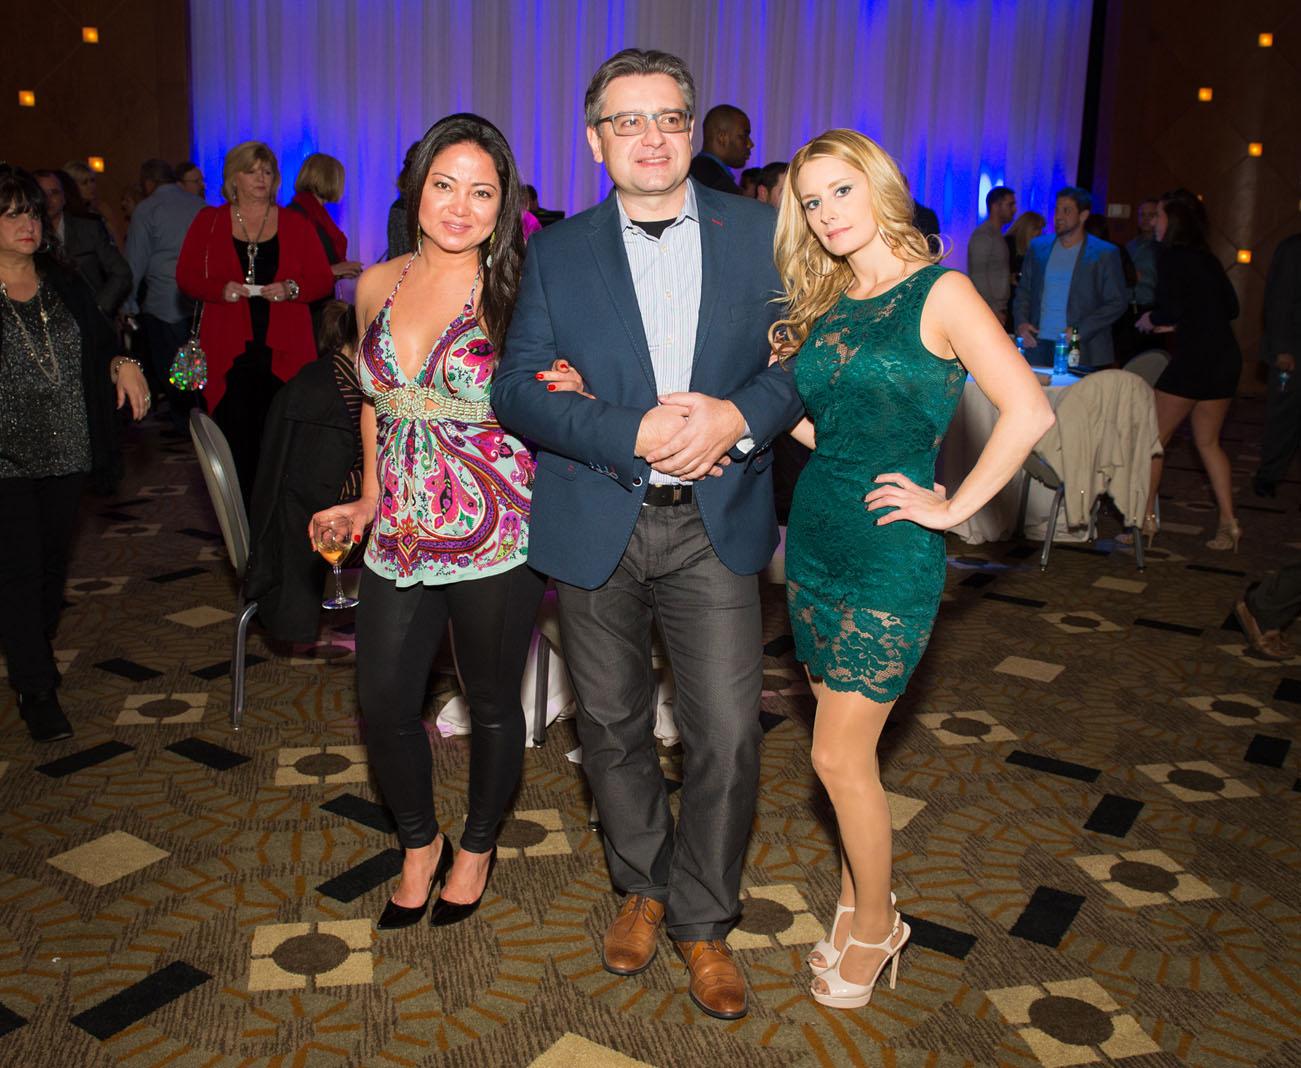 2015-12-09 ReMax Corpoarte Event - The Borgata - Atlantic City NJ - Photo Sesh - 2015-5091.jpg